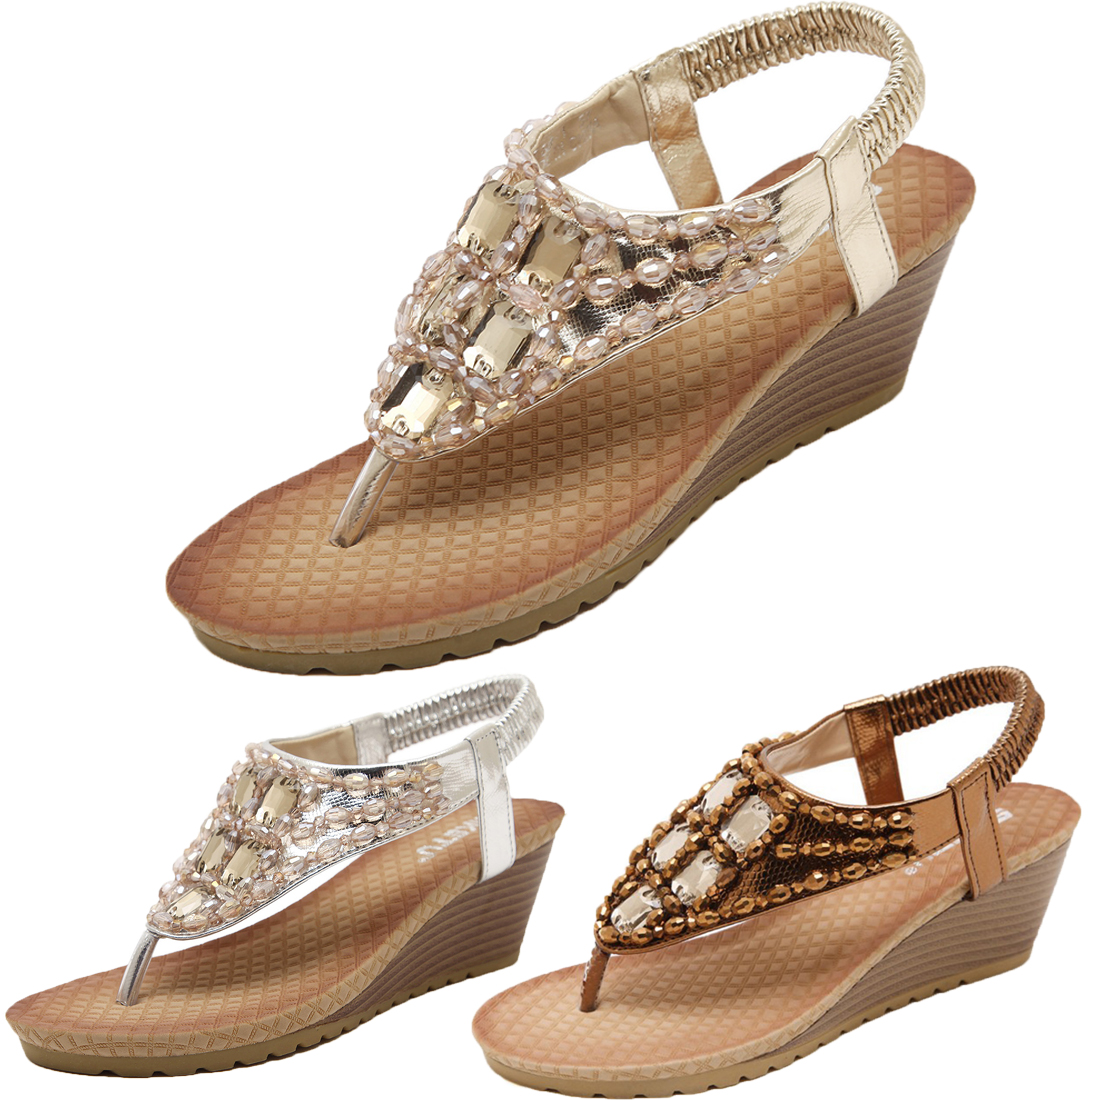 cddcc994172 Women Wedge Sandal Bling Rhinestone Flip Flops Casual Silver Gold Crystal  Platform Sandals Gladiator Shoe Woman Size 35-42